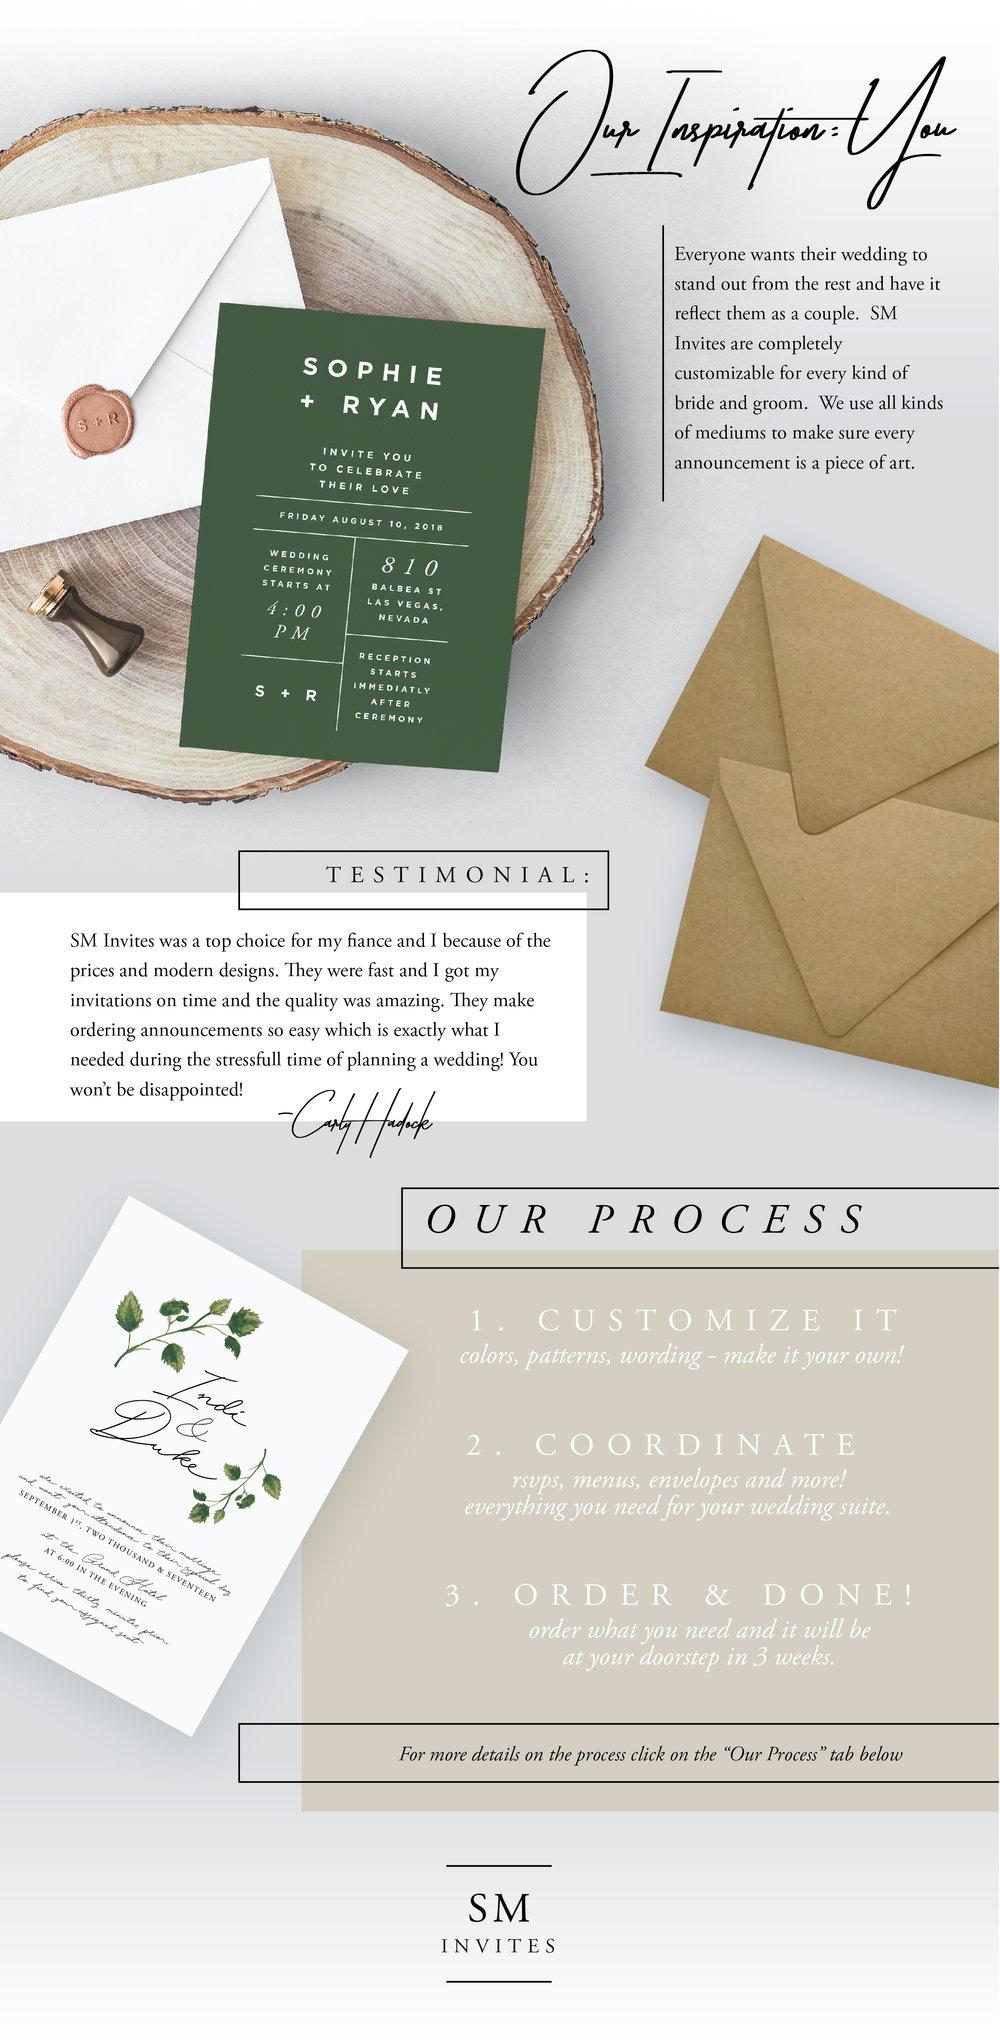 SM Invites Wedding Invitations Utah America